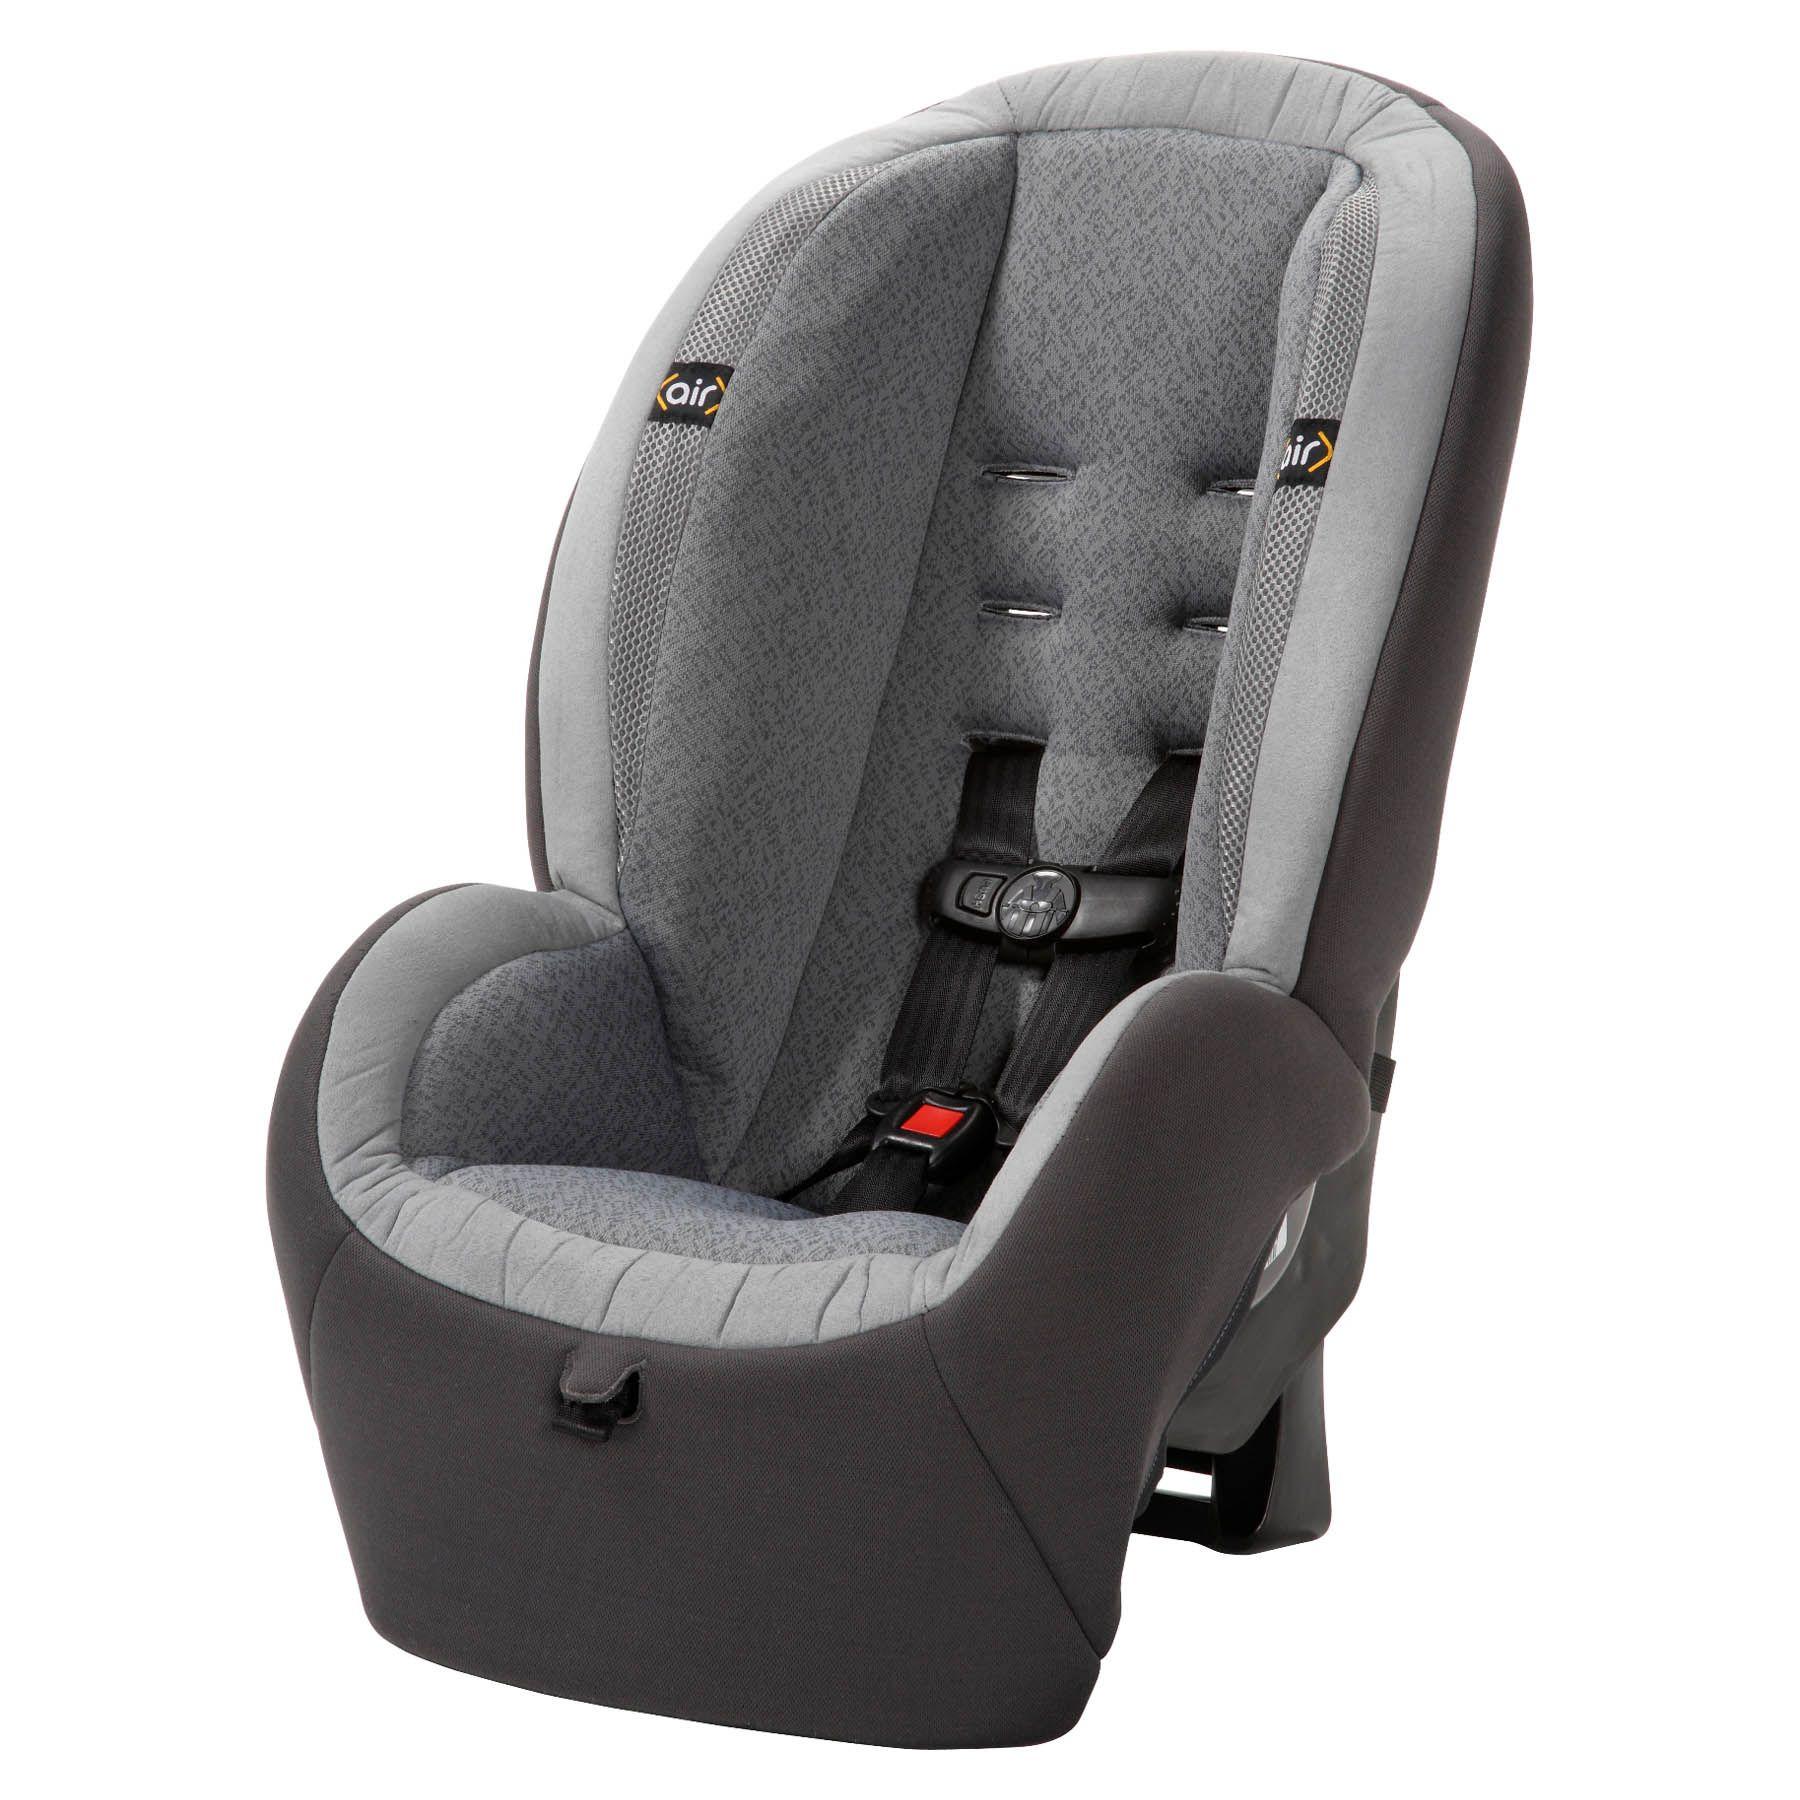 Comfortable Convertible Car Seat